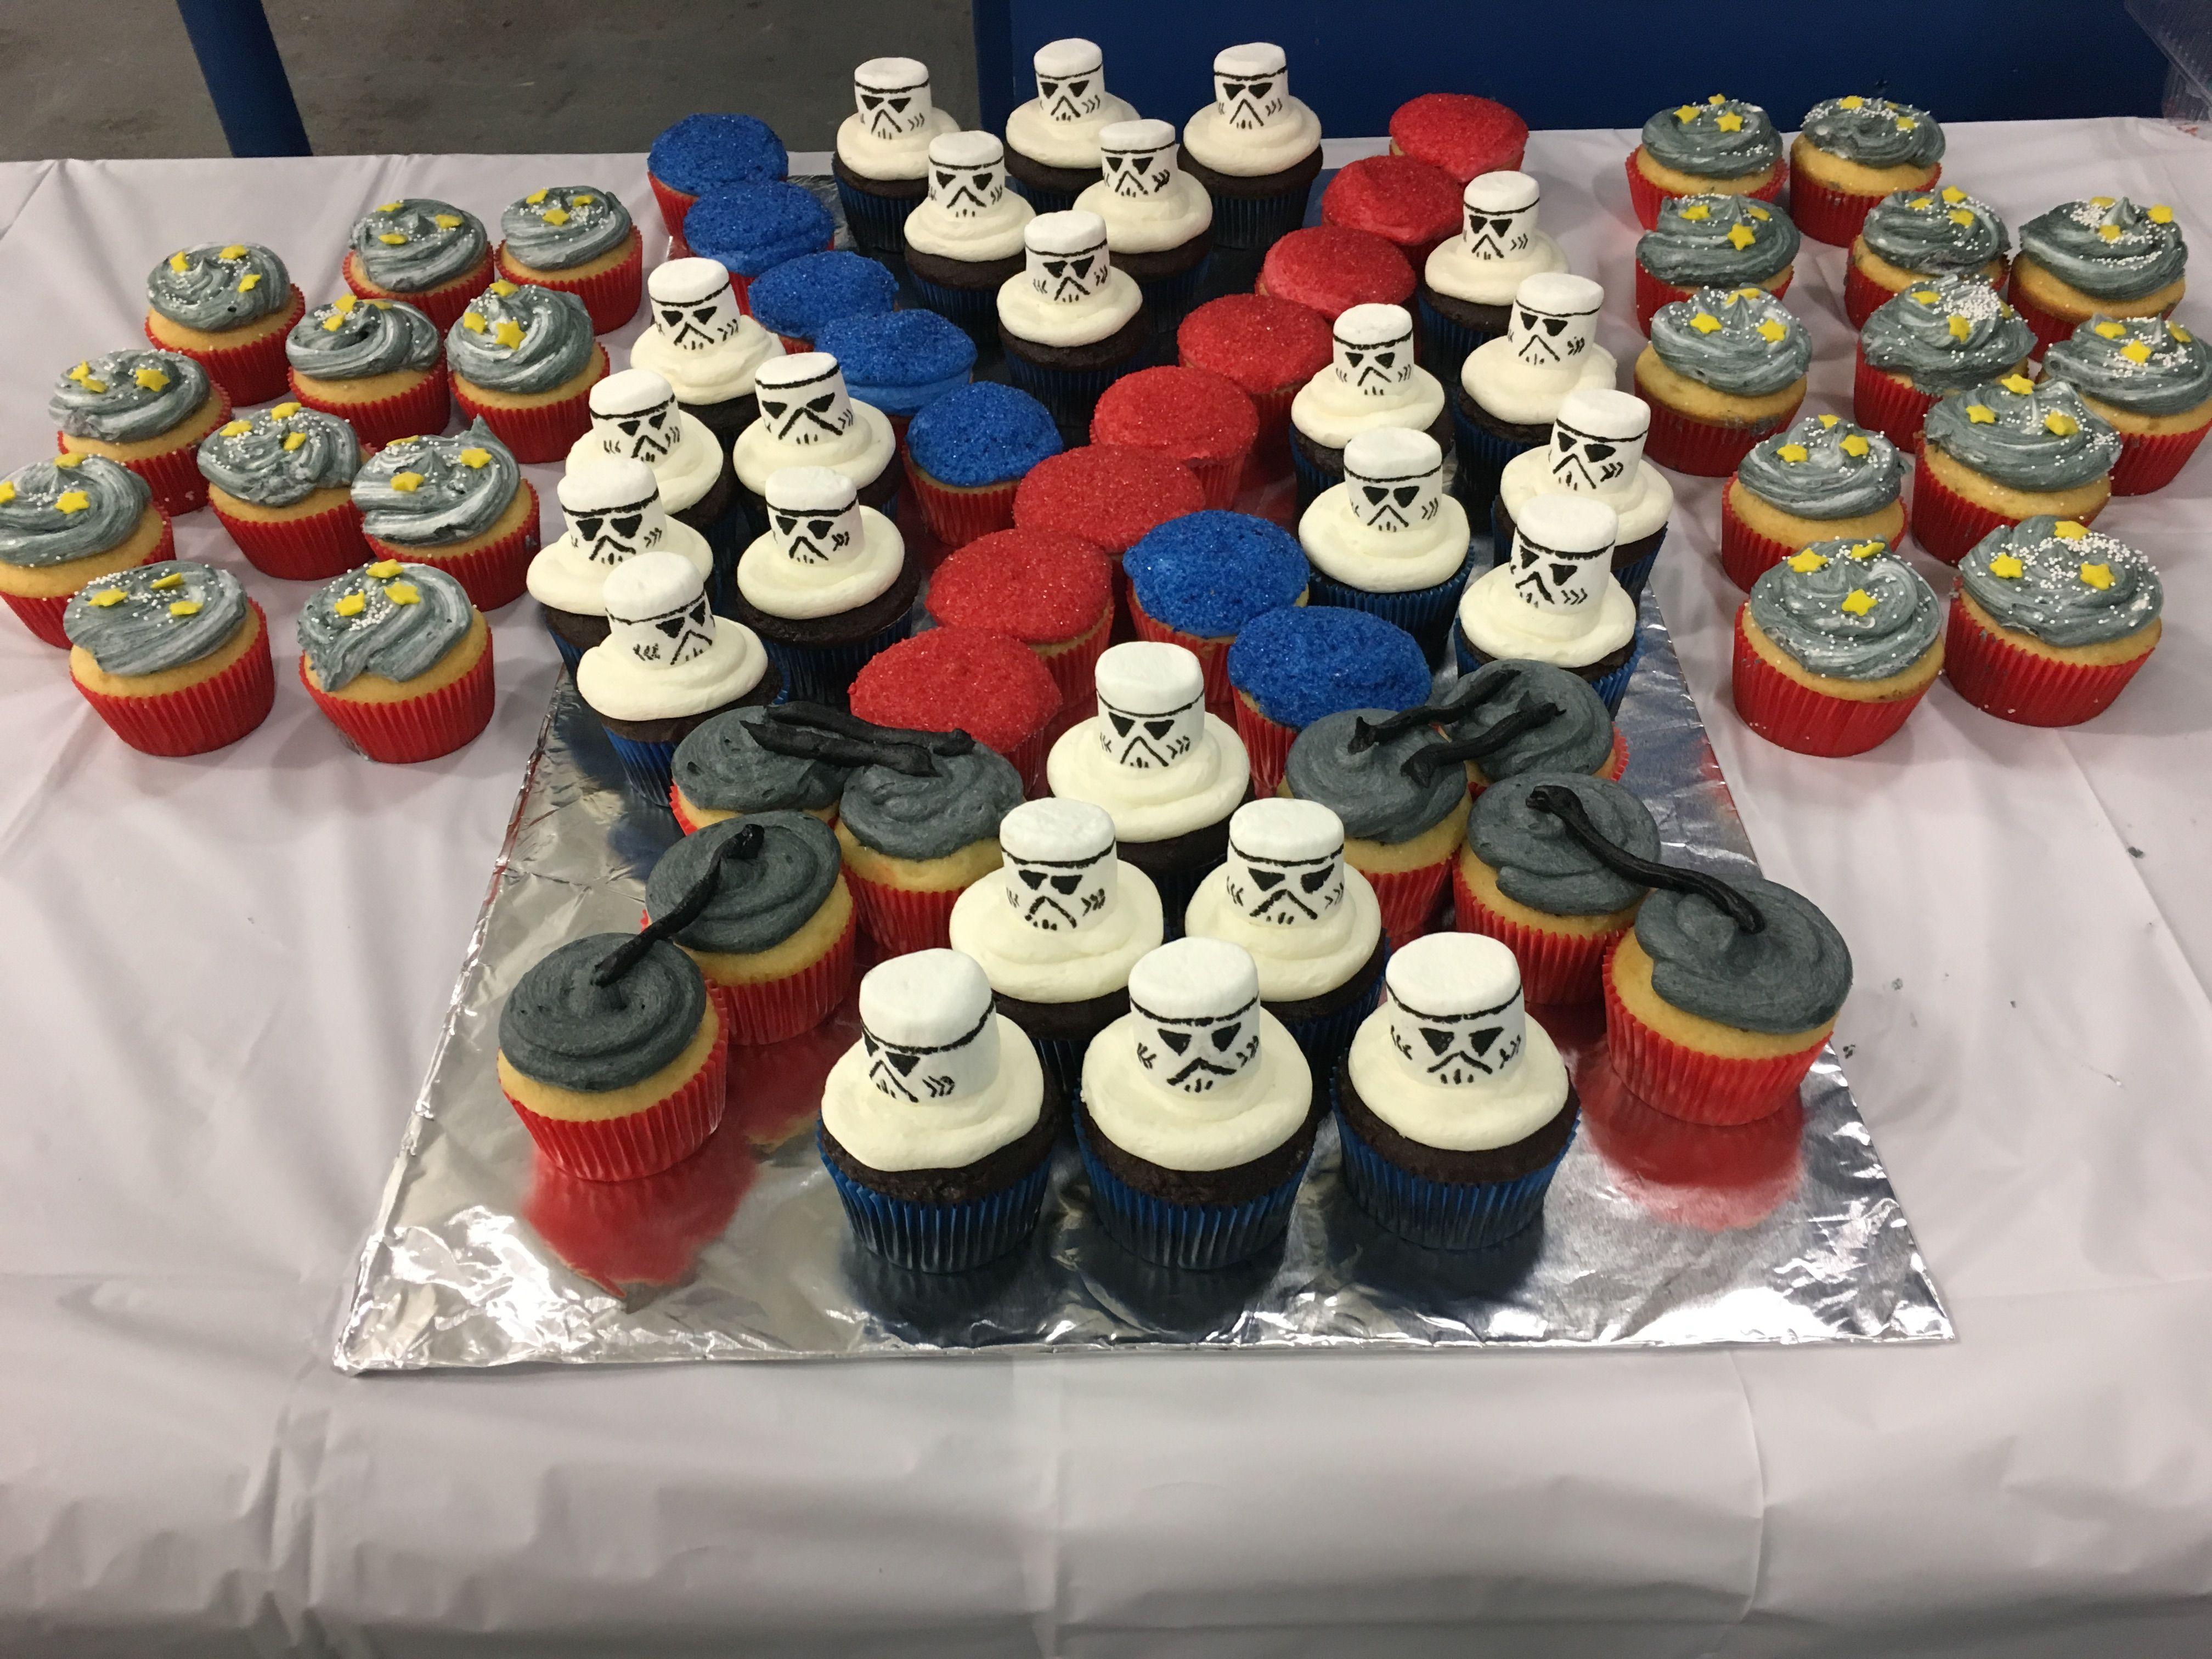 Star Wars Cupcake Cake With Images Star Wars Birthday Cake